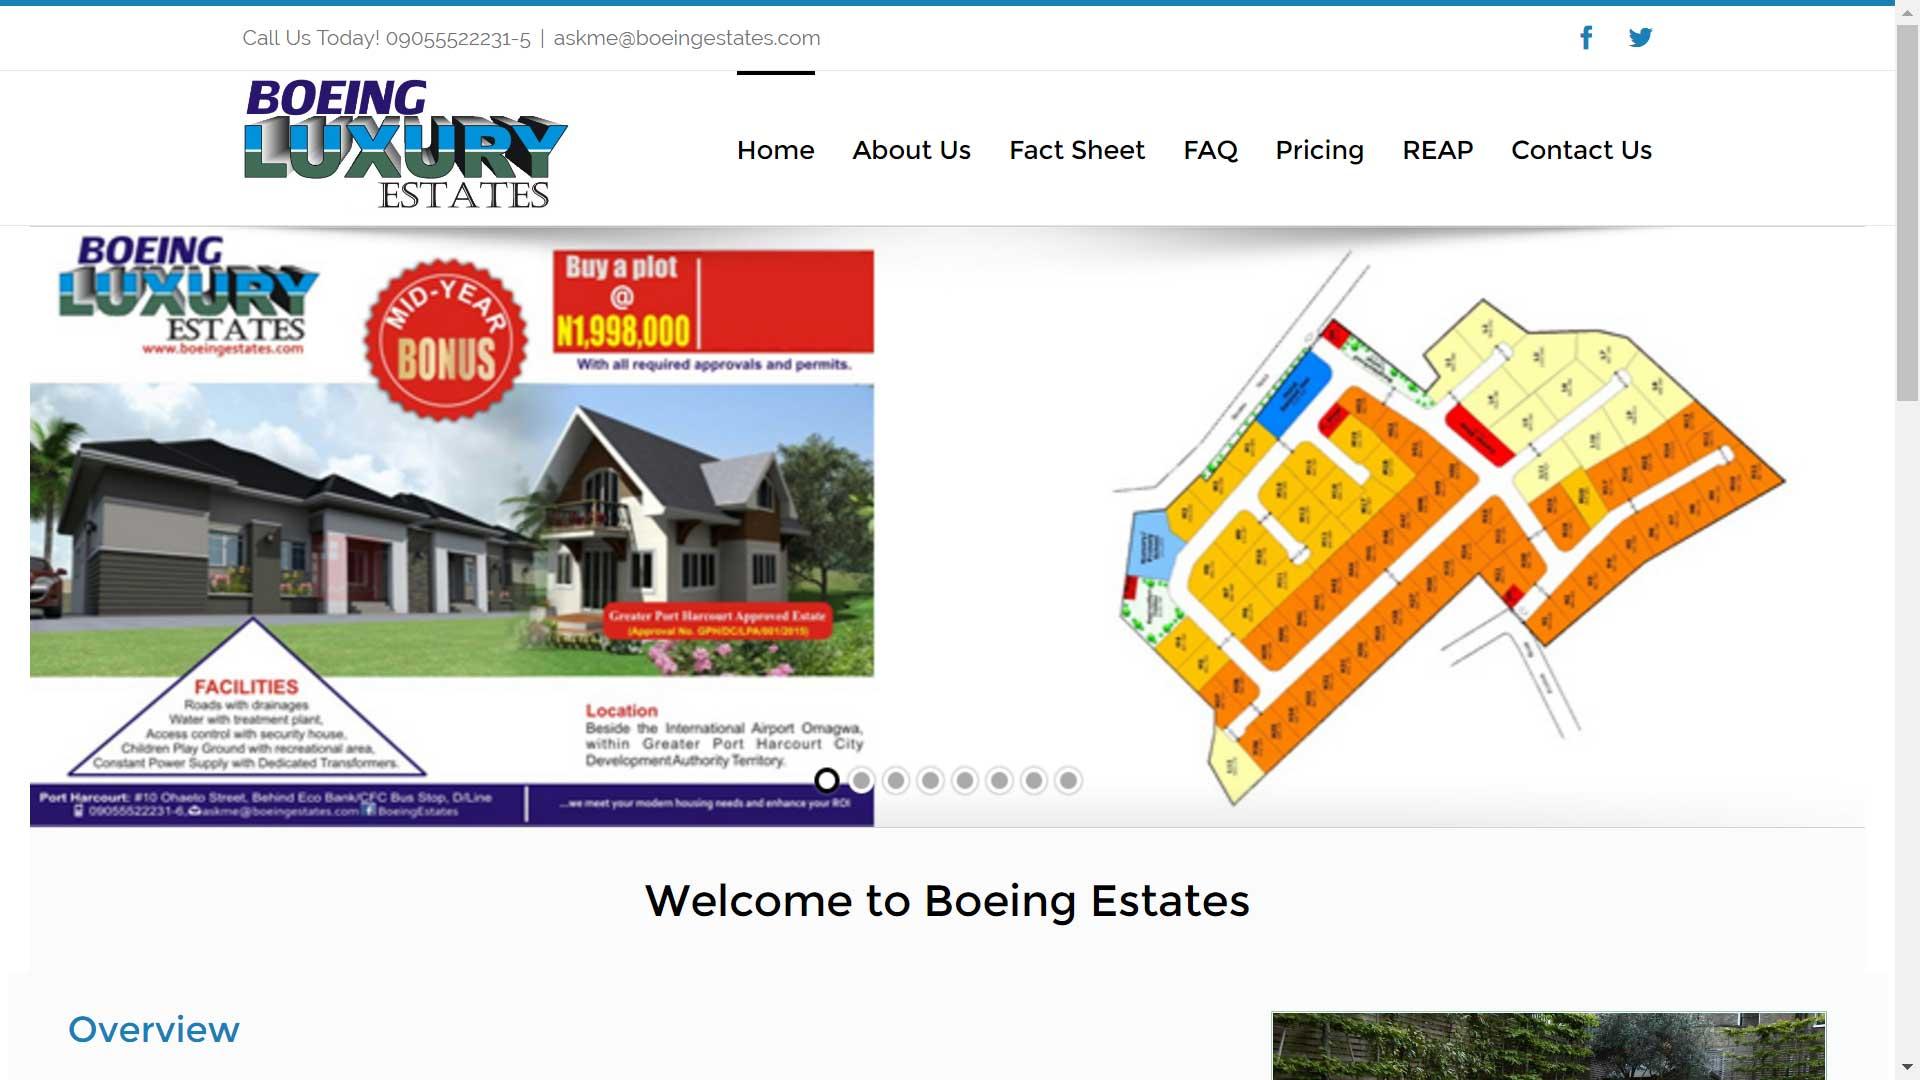 Boeing Luxury Estates